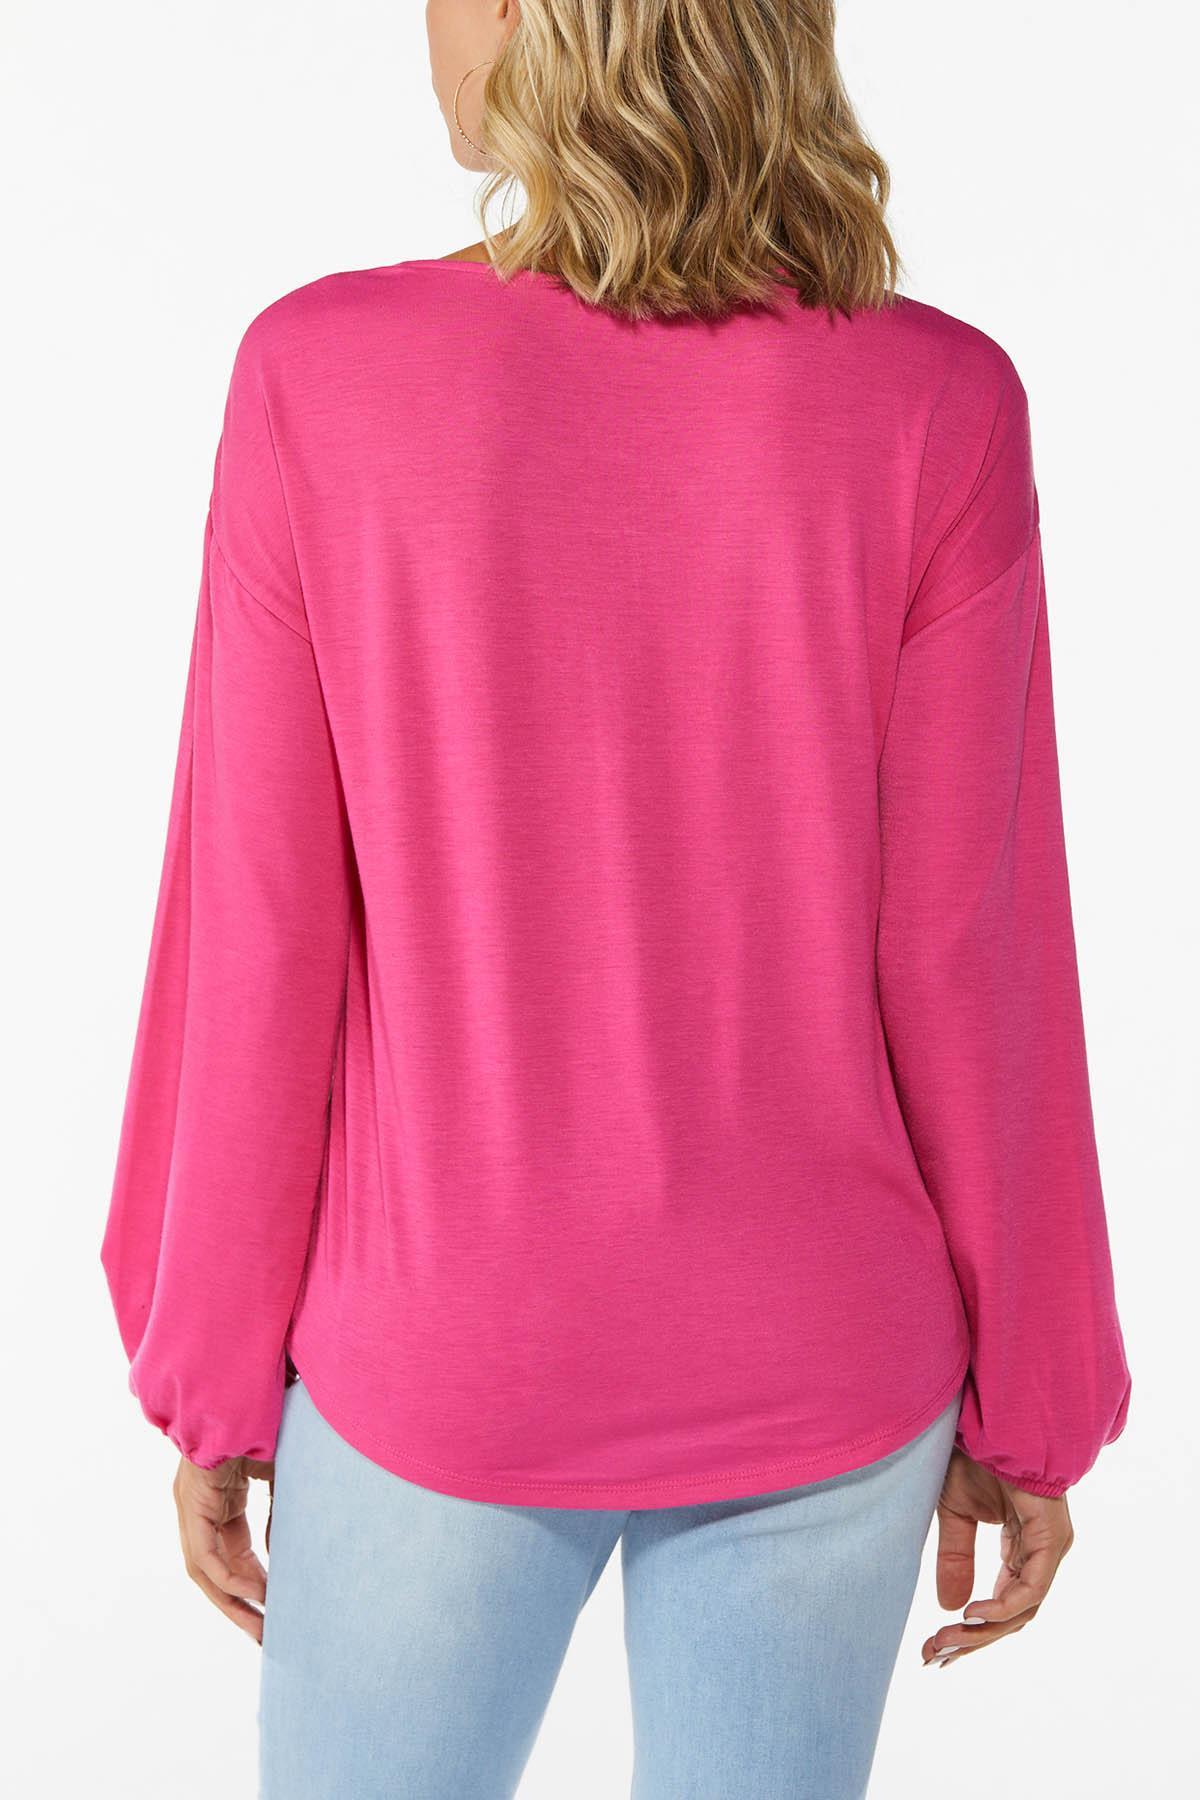 Plus Size Sleek Fuchsia Cinch Front Top (Item #44779182)